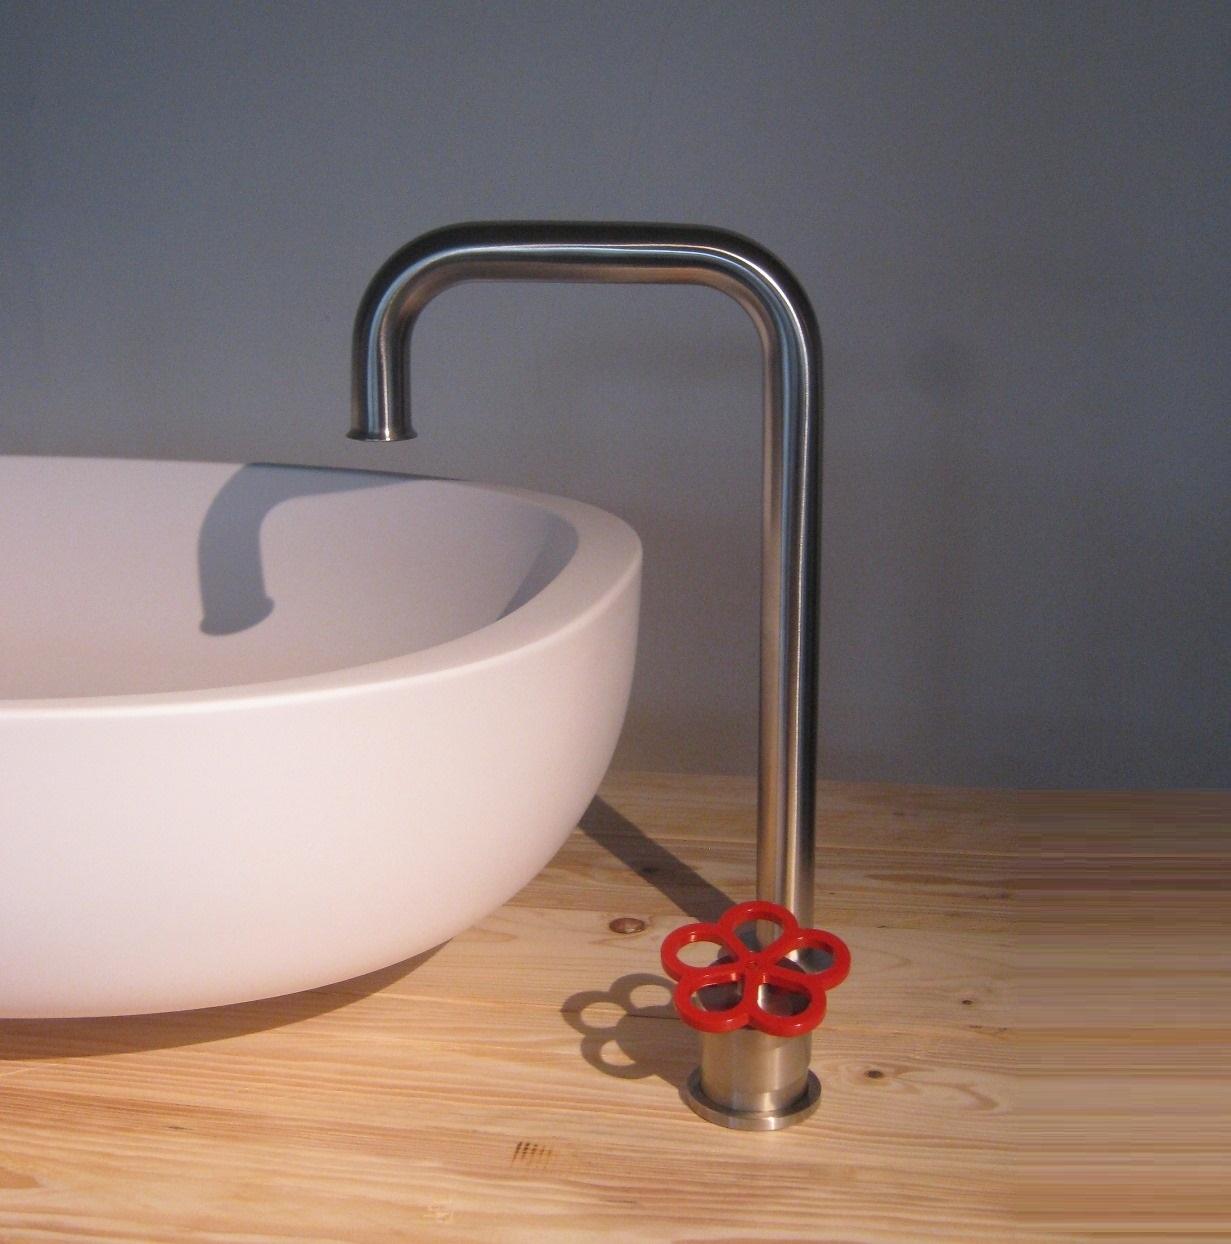 boffi miscelatore pipe con lavabo iceland, boffi bathroom design ... - Arredo Bagno Boffi